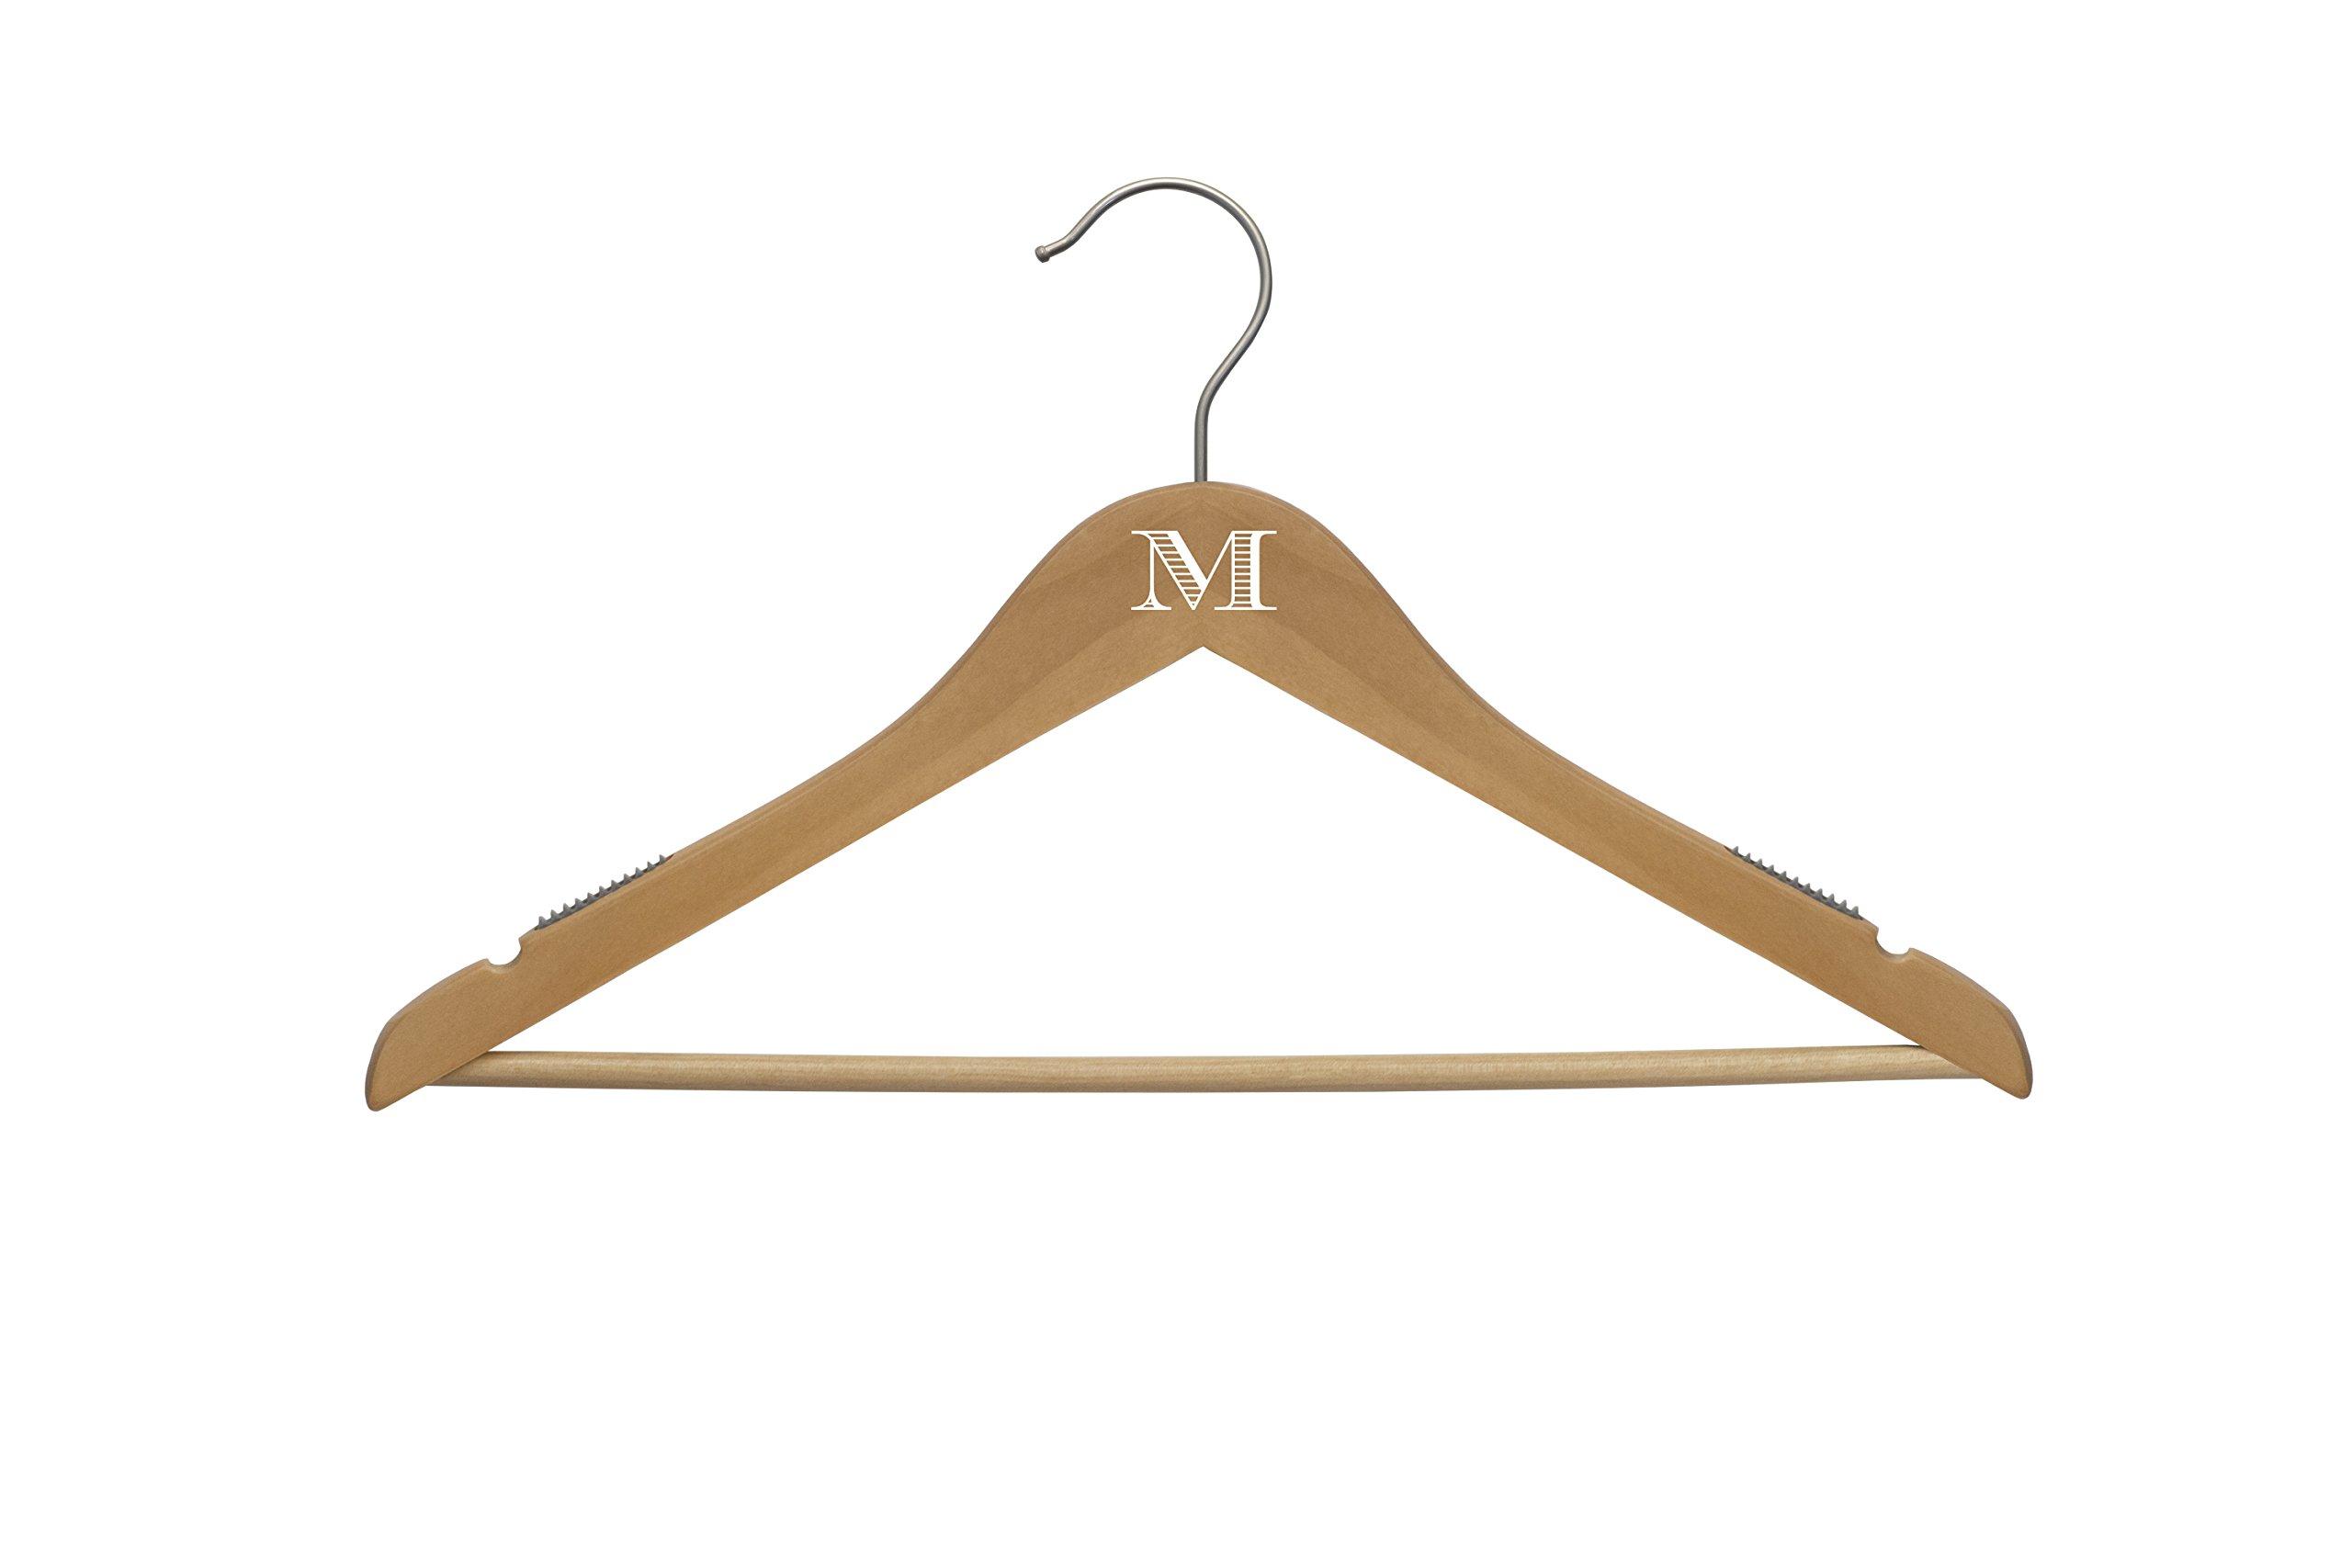 NAHANCO Personalized Wooden Hangers -17'' Monogramed Custom Hangers -20017WBC Natural Top Suit Wood Hanger – 100 piece Pack